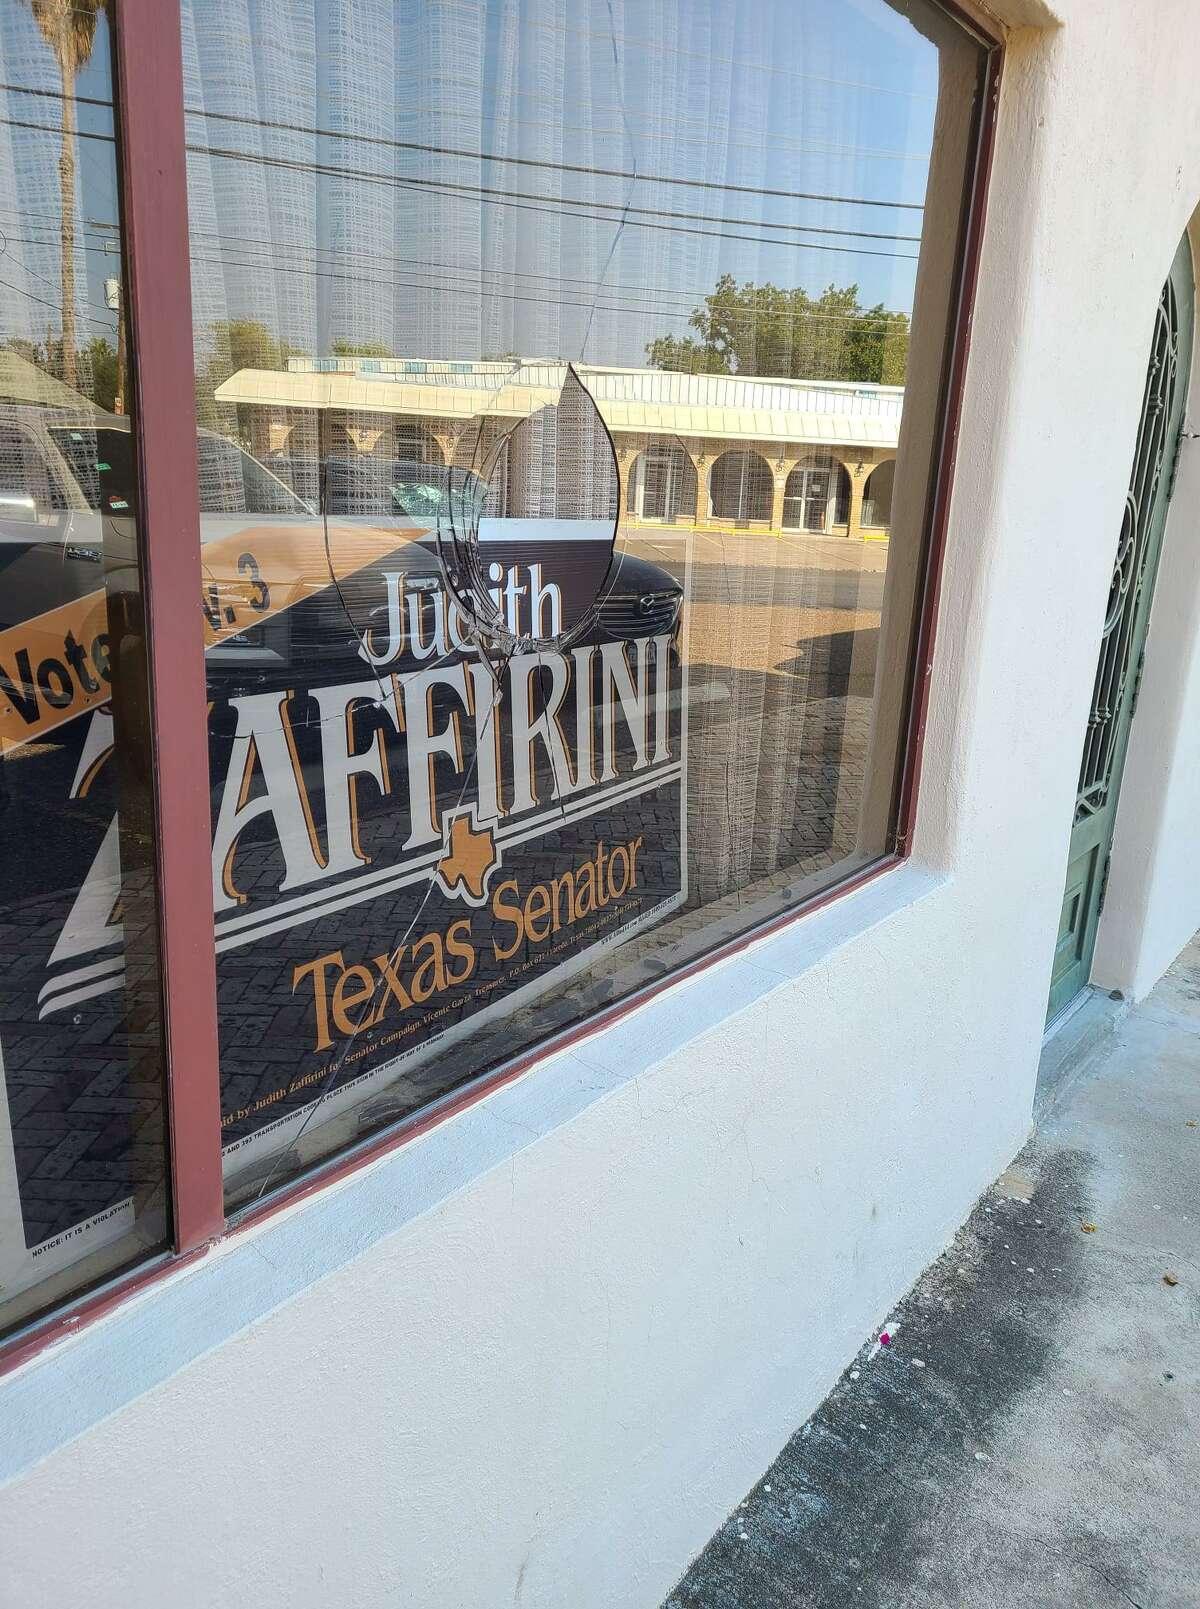 Shown is the damage to a window at Texas Senator Judith Zaffirini's campaign headquarters.